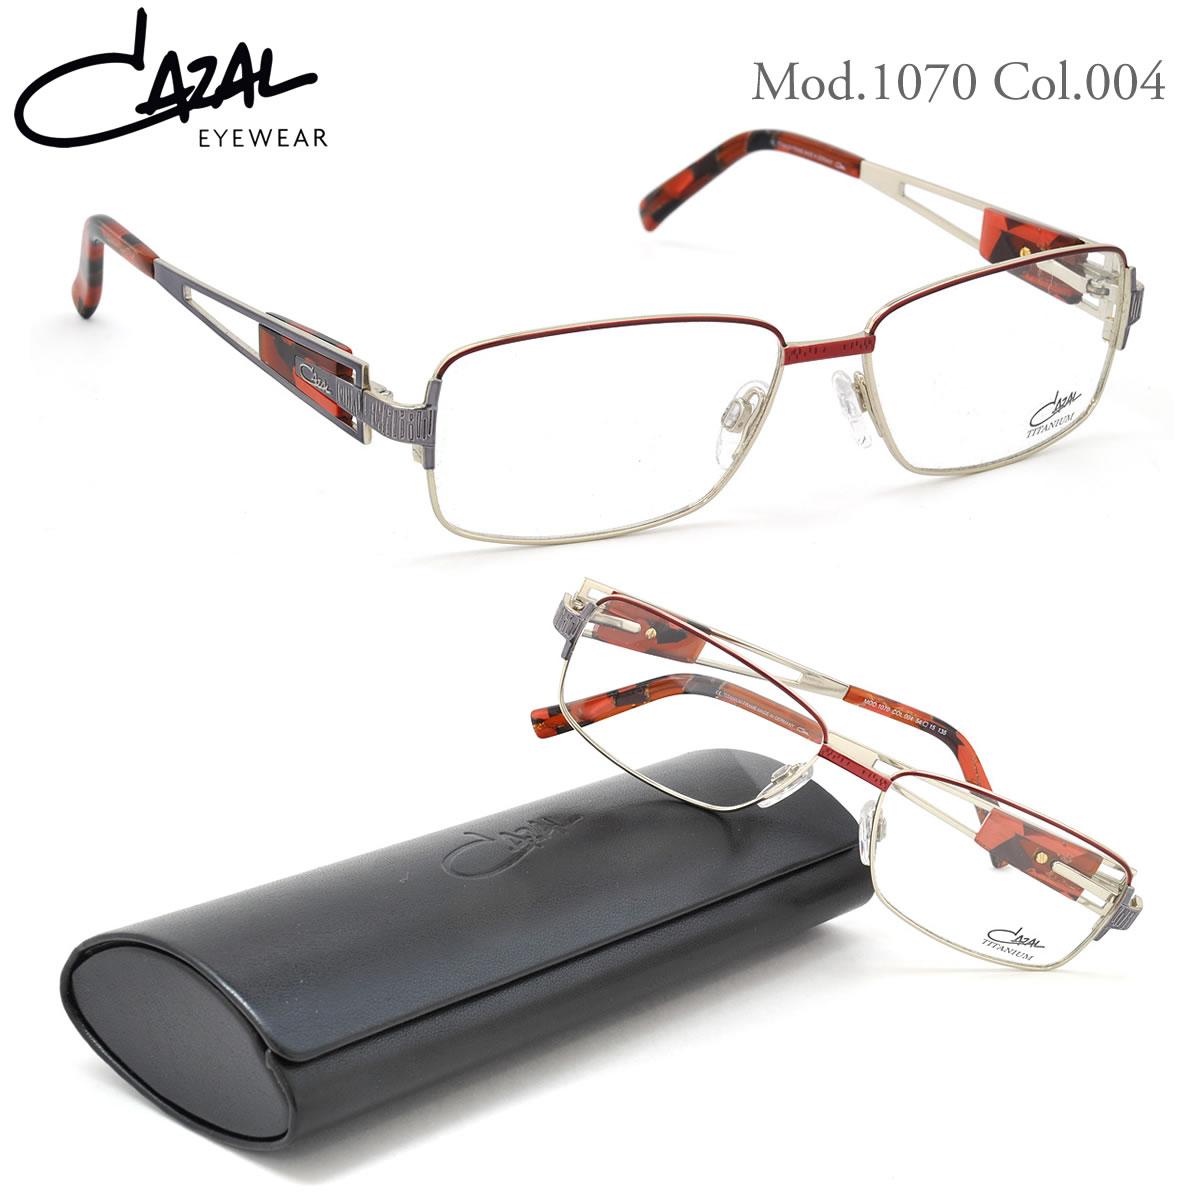 CAZAL カザール メガネ 1070 004 54サイズ CAZAL 伊達メガネレンズ無料 メンズ レディース